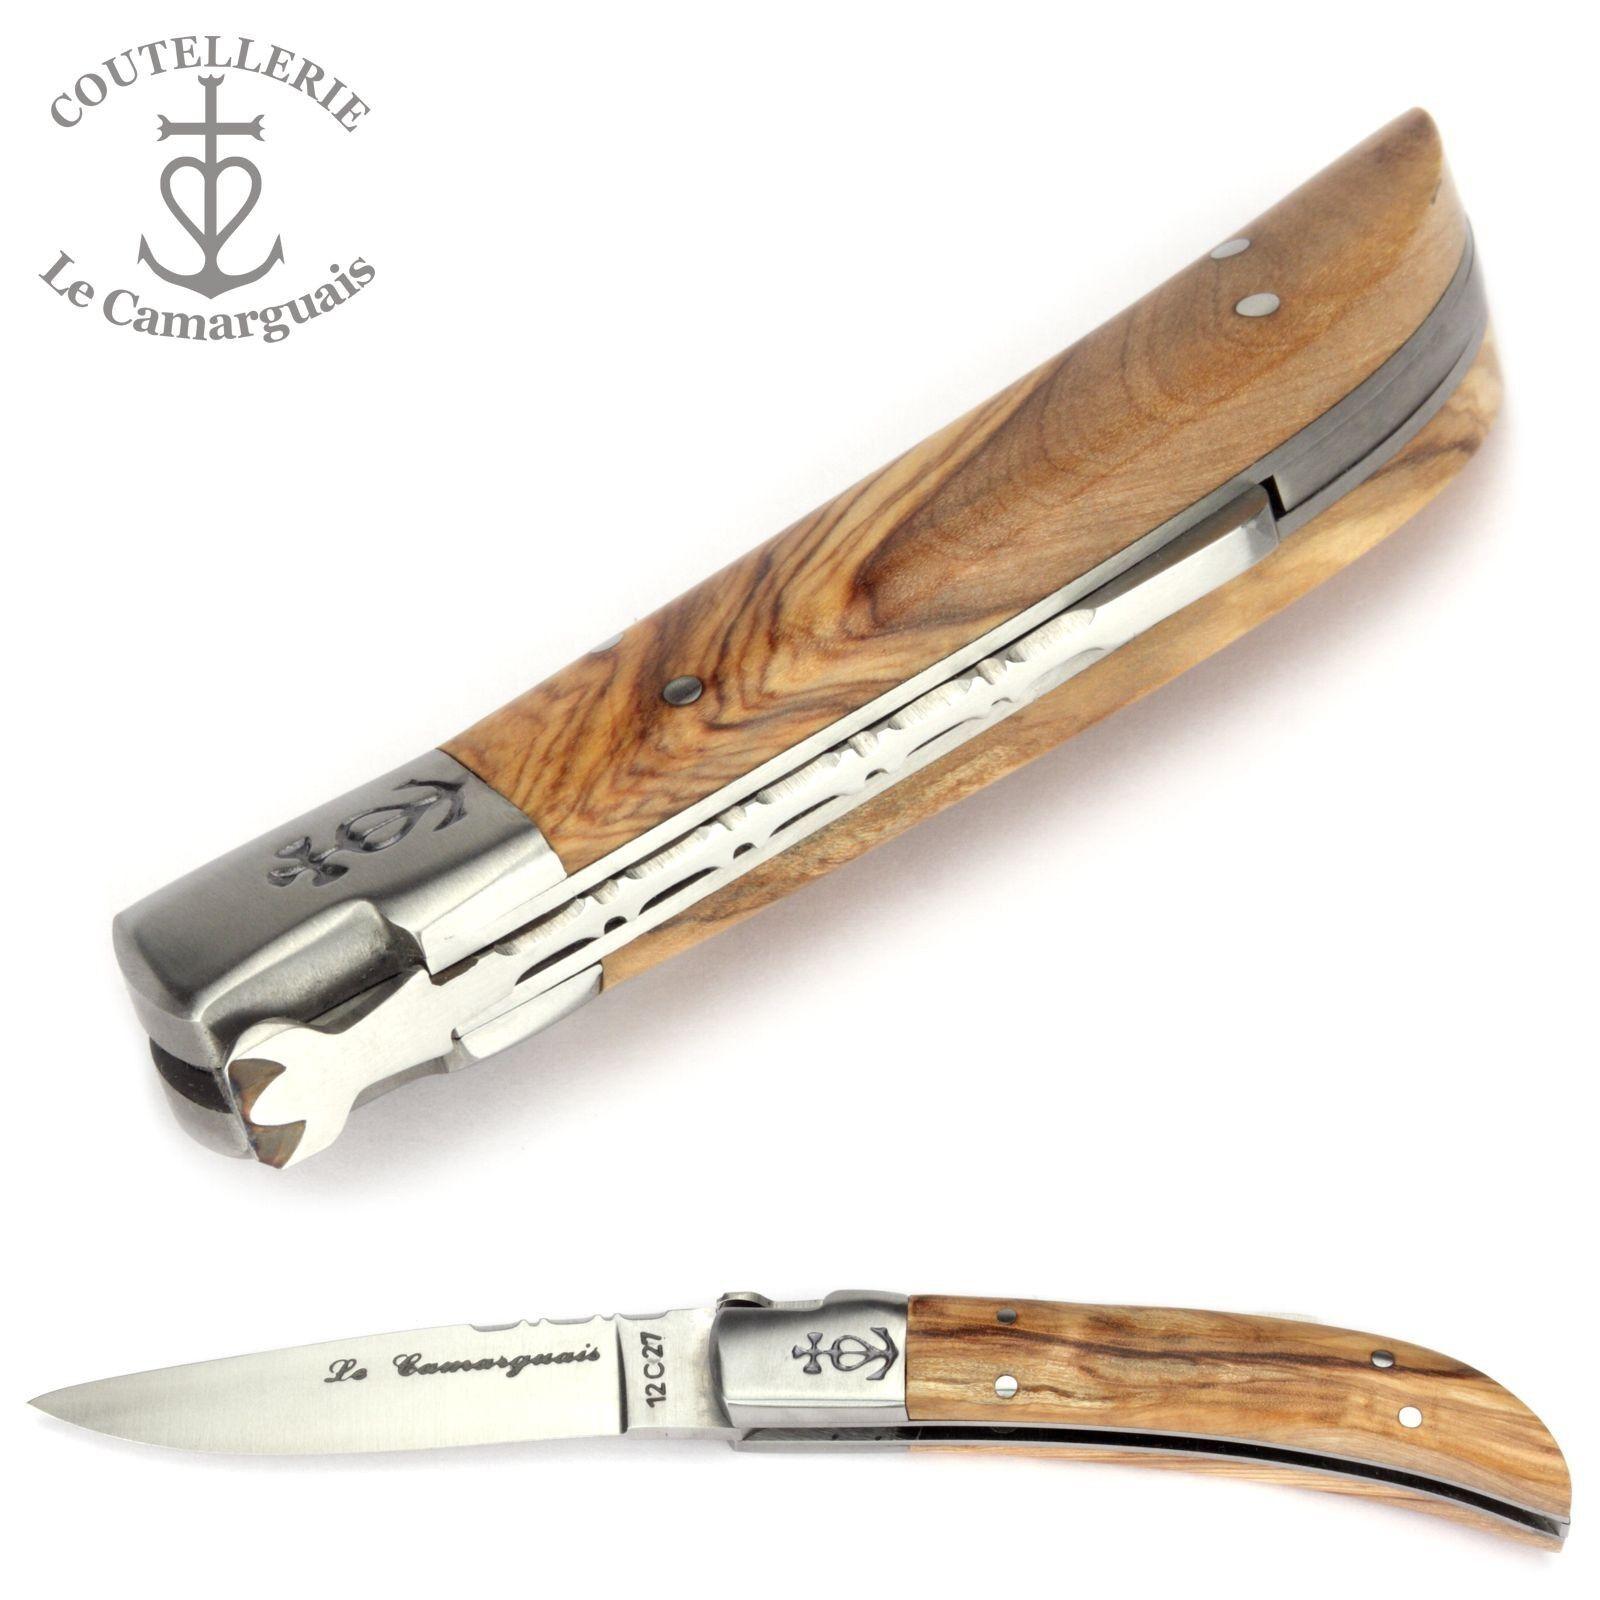 Le Camarguais Taschenmesser 10 cm Griff Olivenholz - - Olivenholz Messer Camargue Frankreich 7514b2